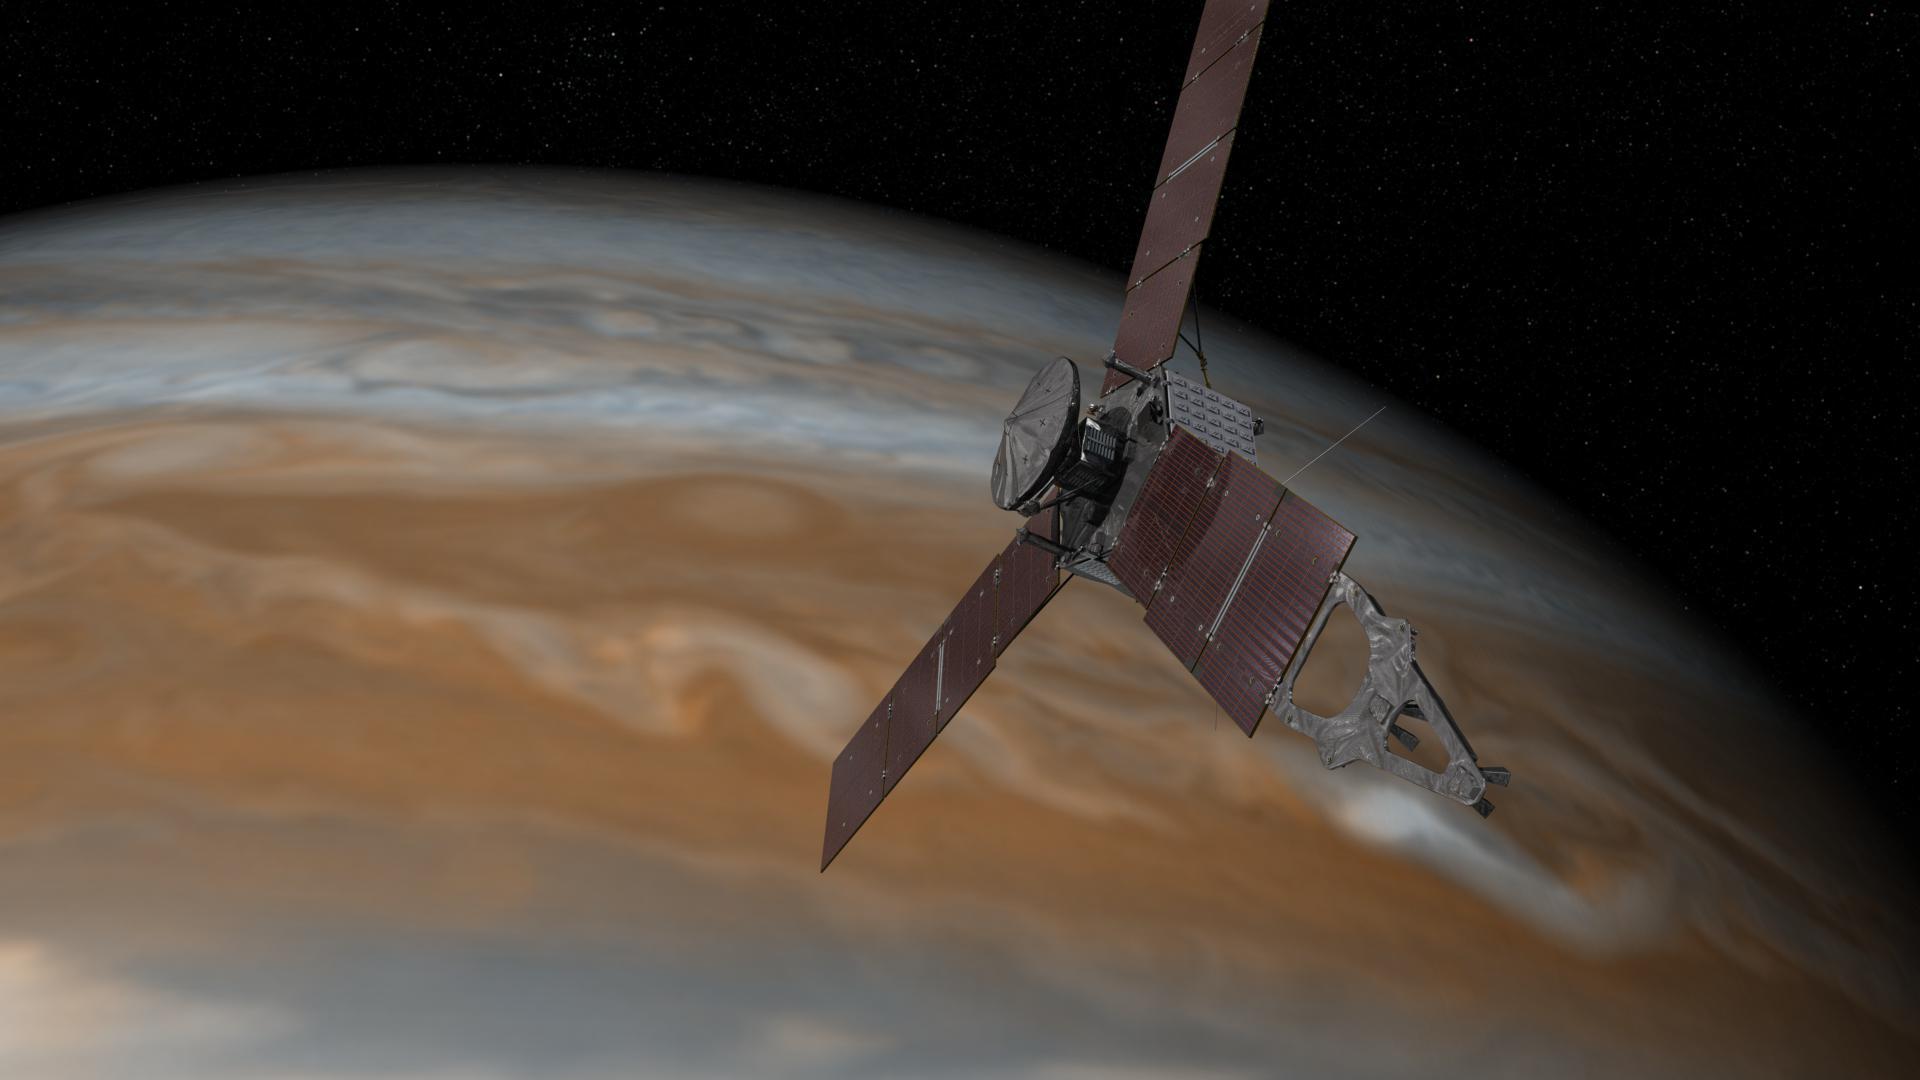 Artist's concept of the solar-powered Juno spacecraft at Jupiter. Credit: NASA/JPL-Caltech